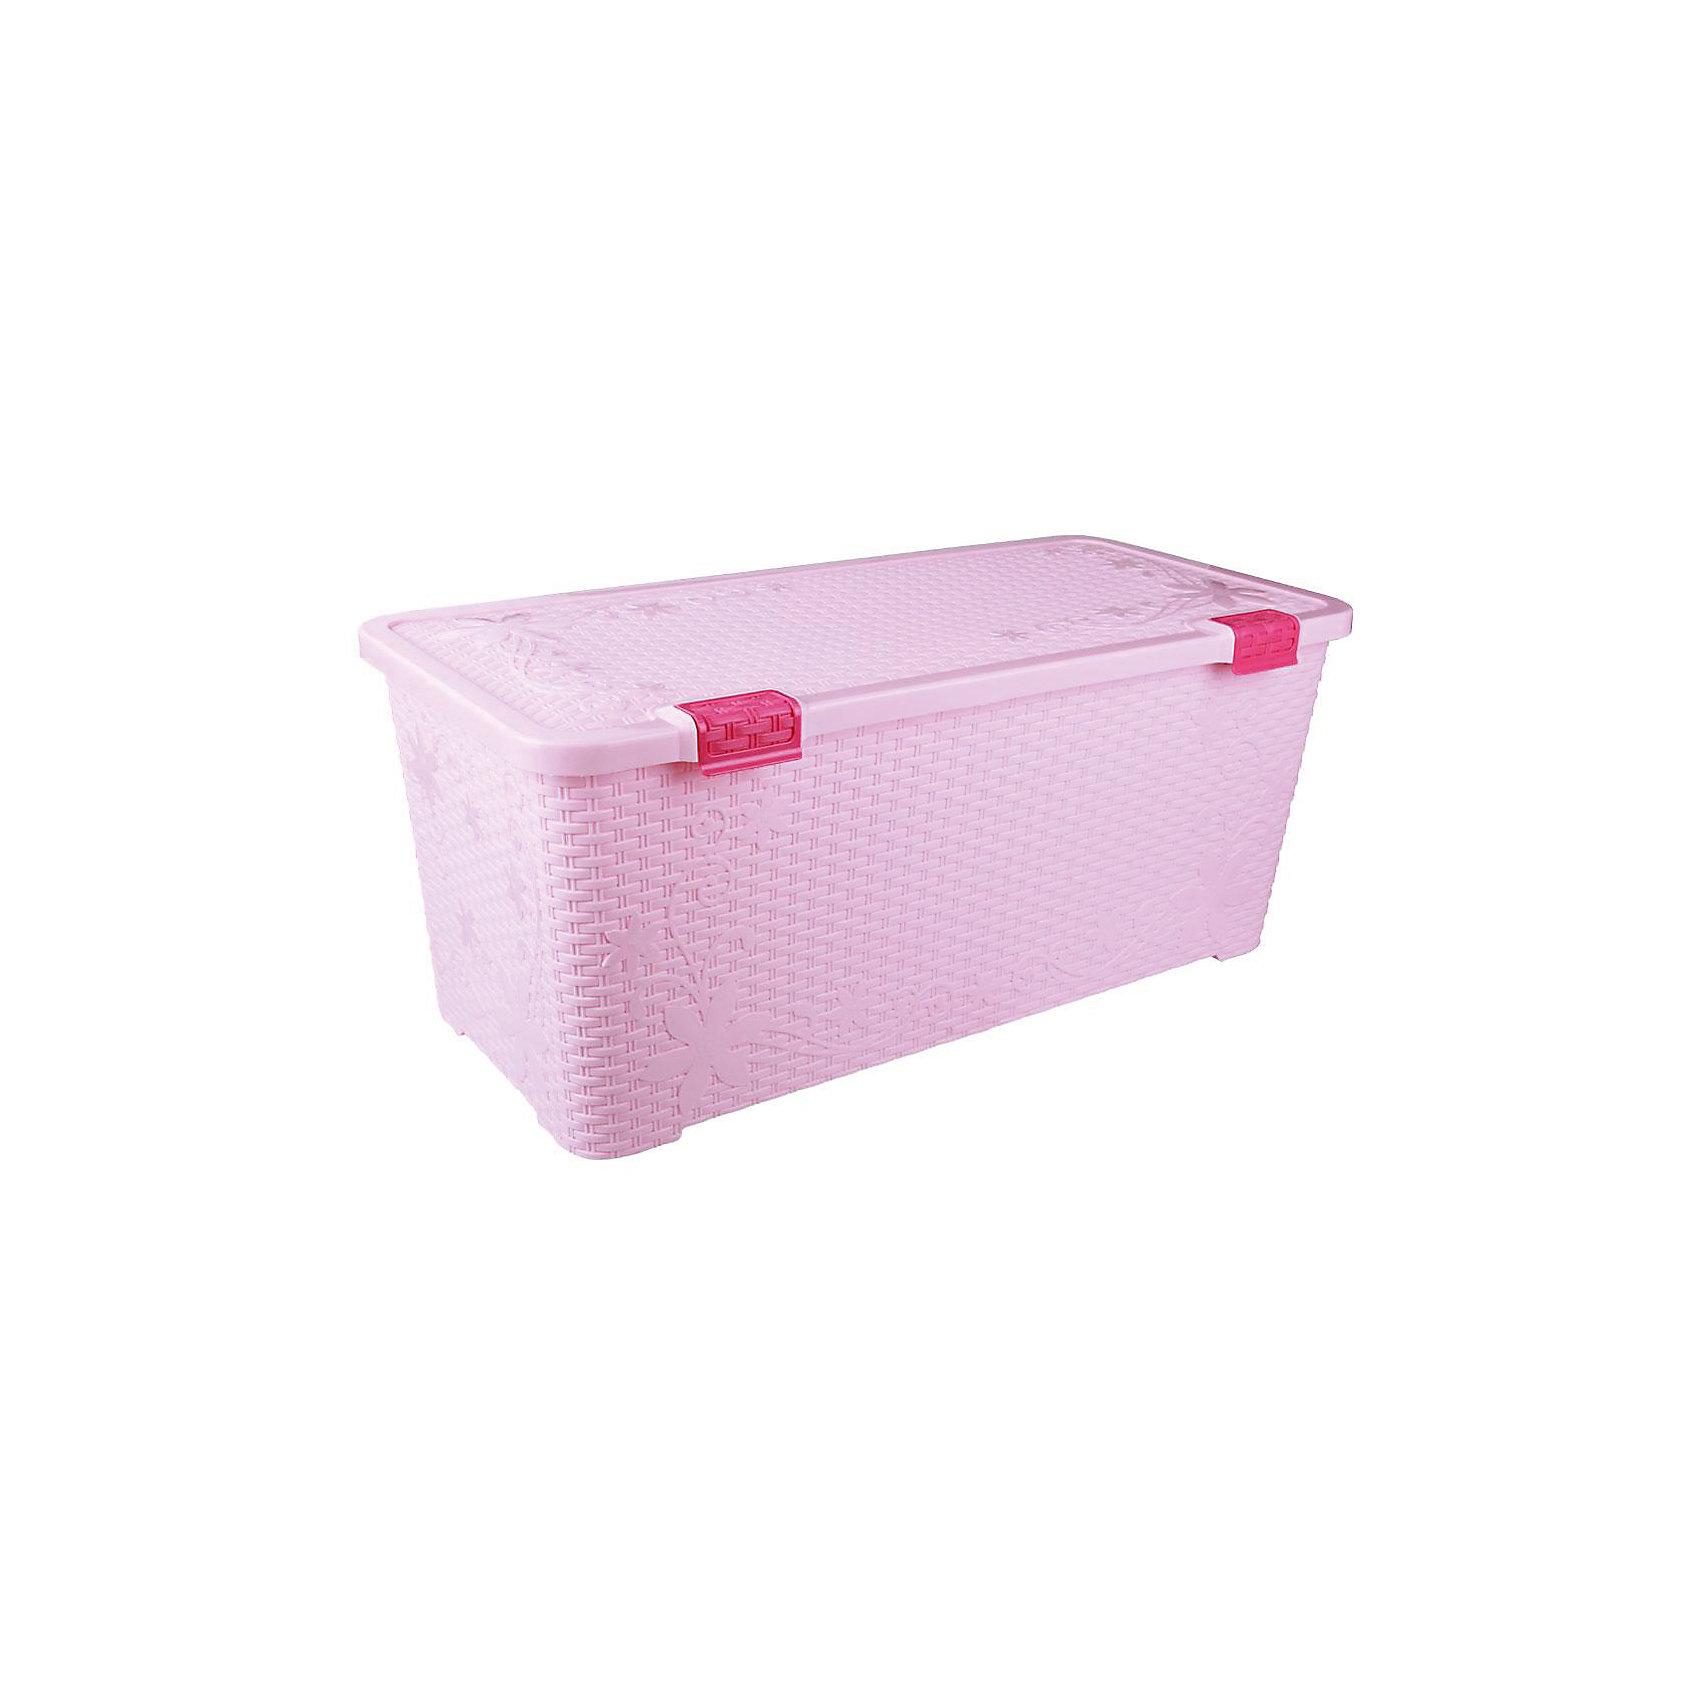 Alternativa Контейнер Плетёнка 100л. с крышкой, Alternativa, розовый alternativa горка для купания alternativa розовый